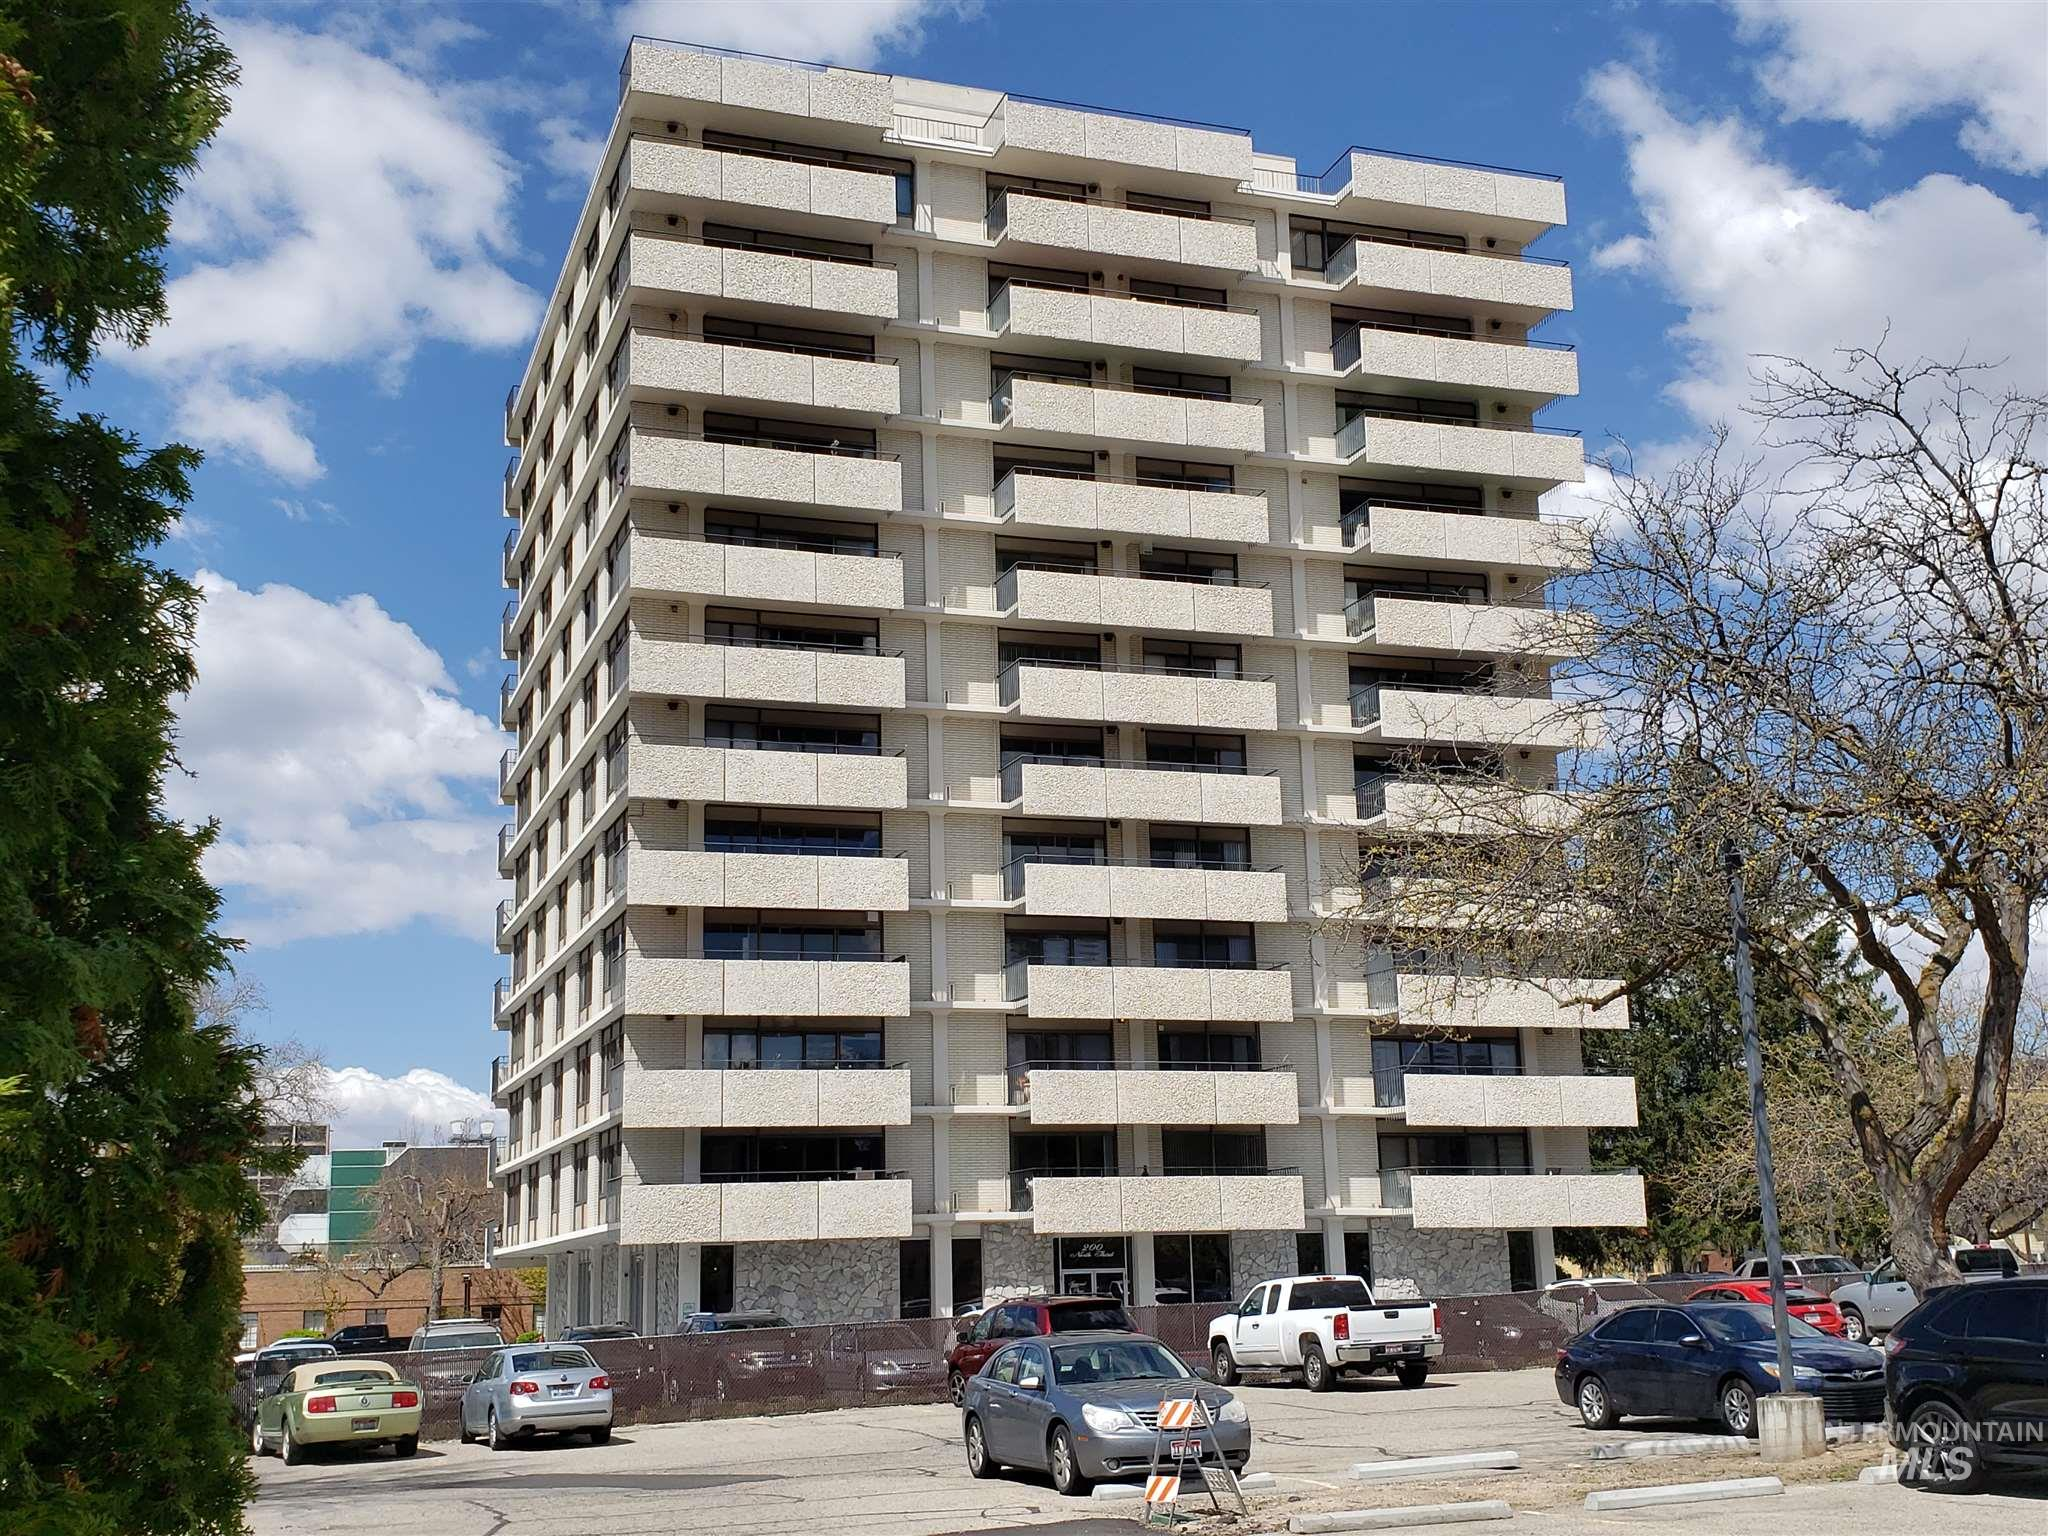 200 N 3rd St # 304 Property Photo - Boise, ID real estate listing